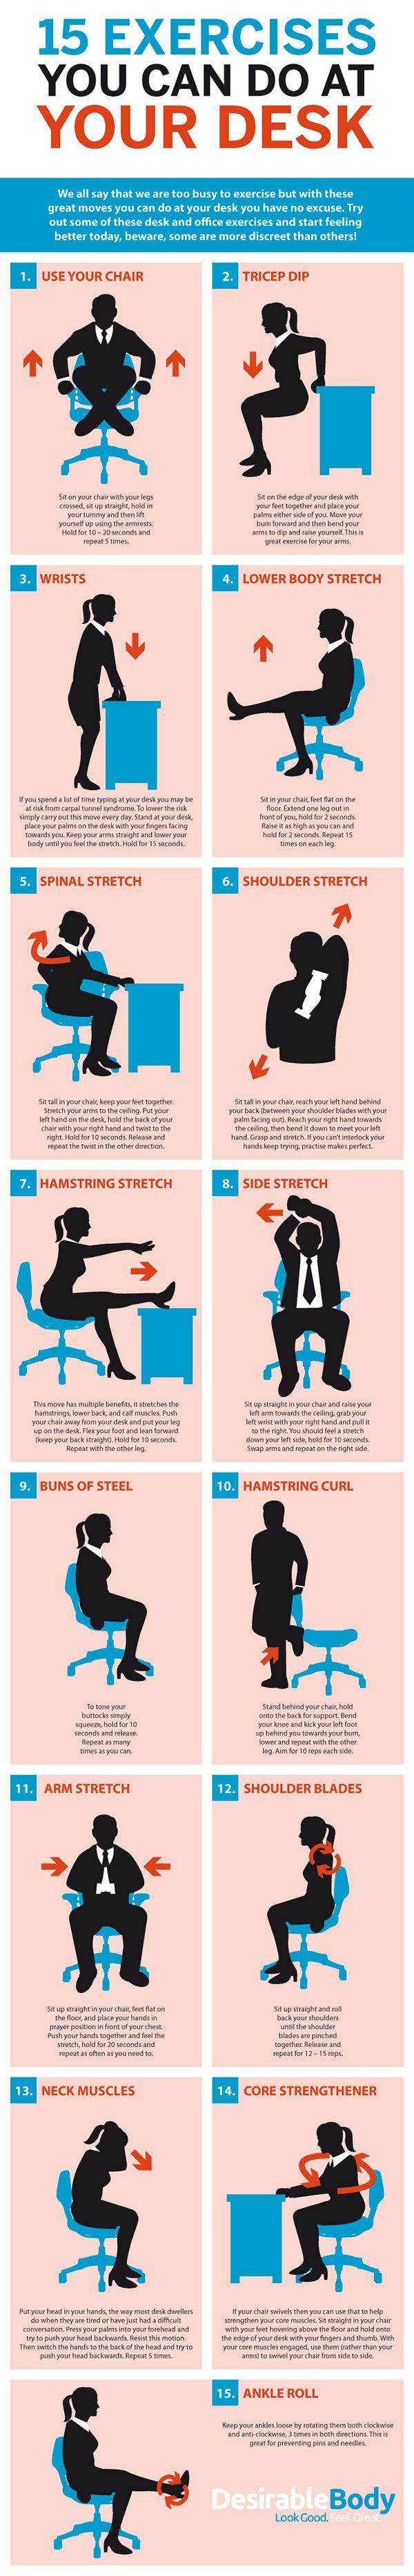 25 best ideas about Desk Exercises on Pinterest  Office